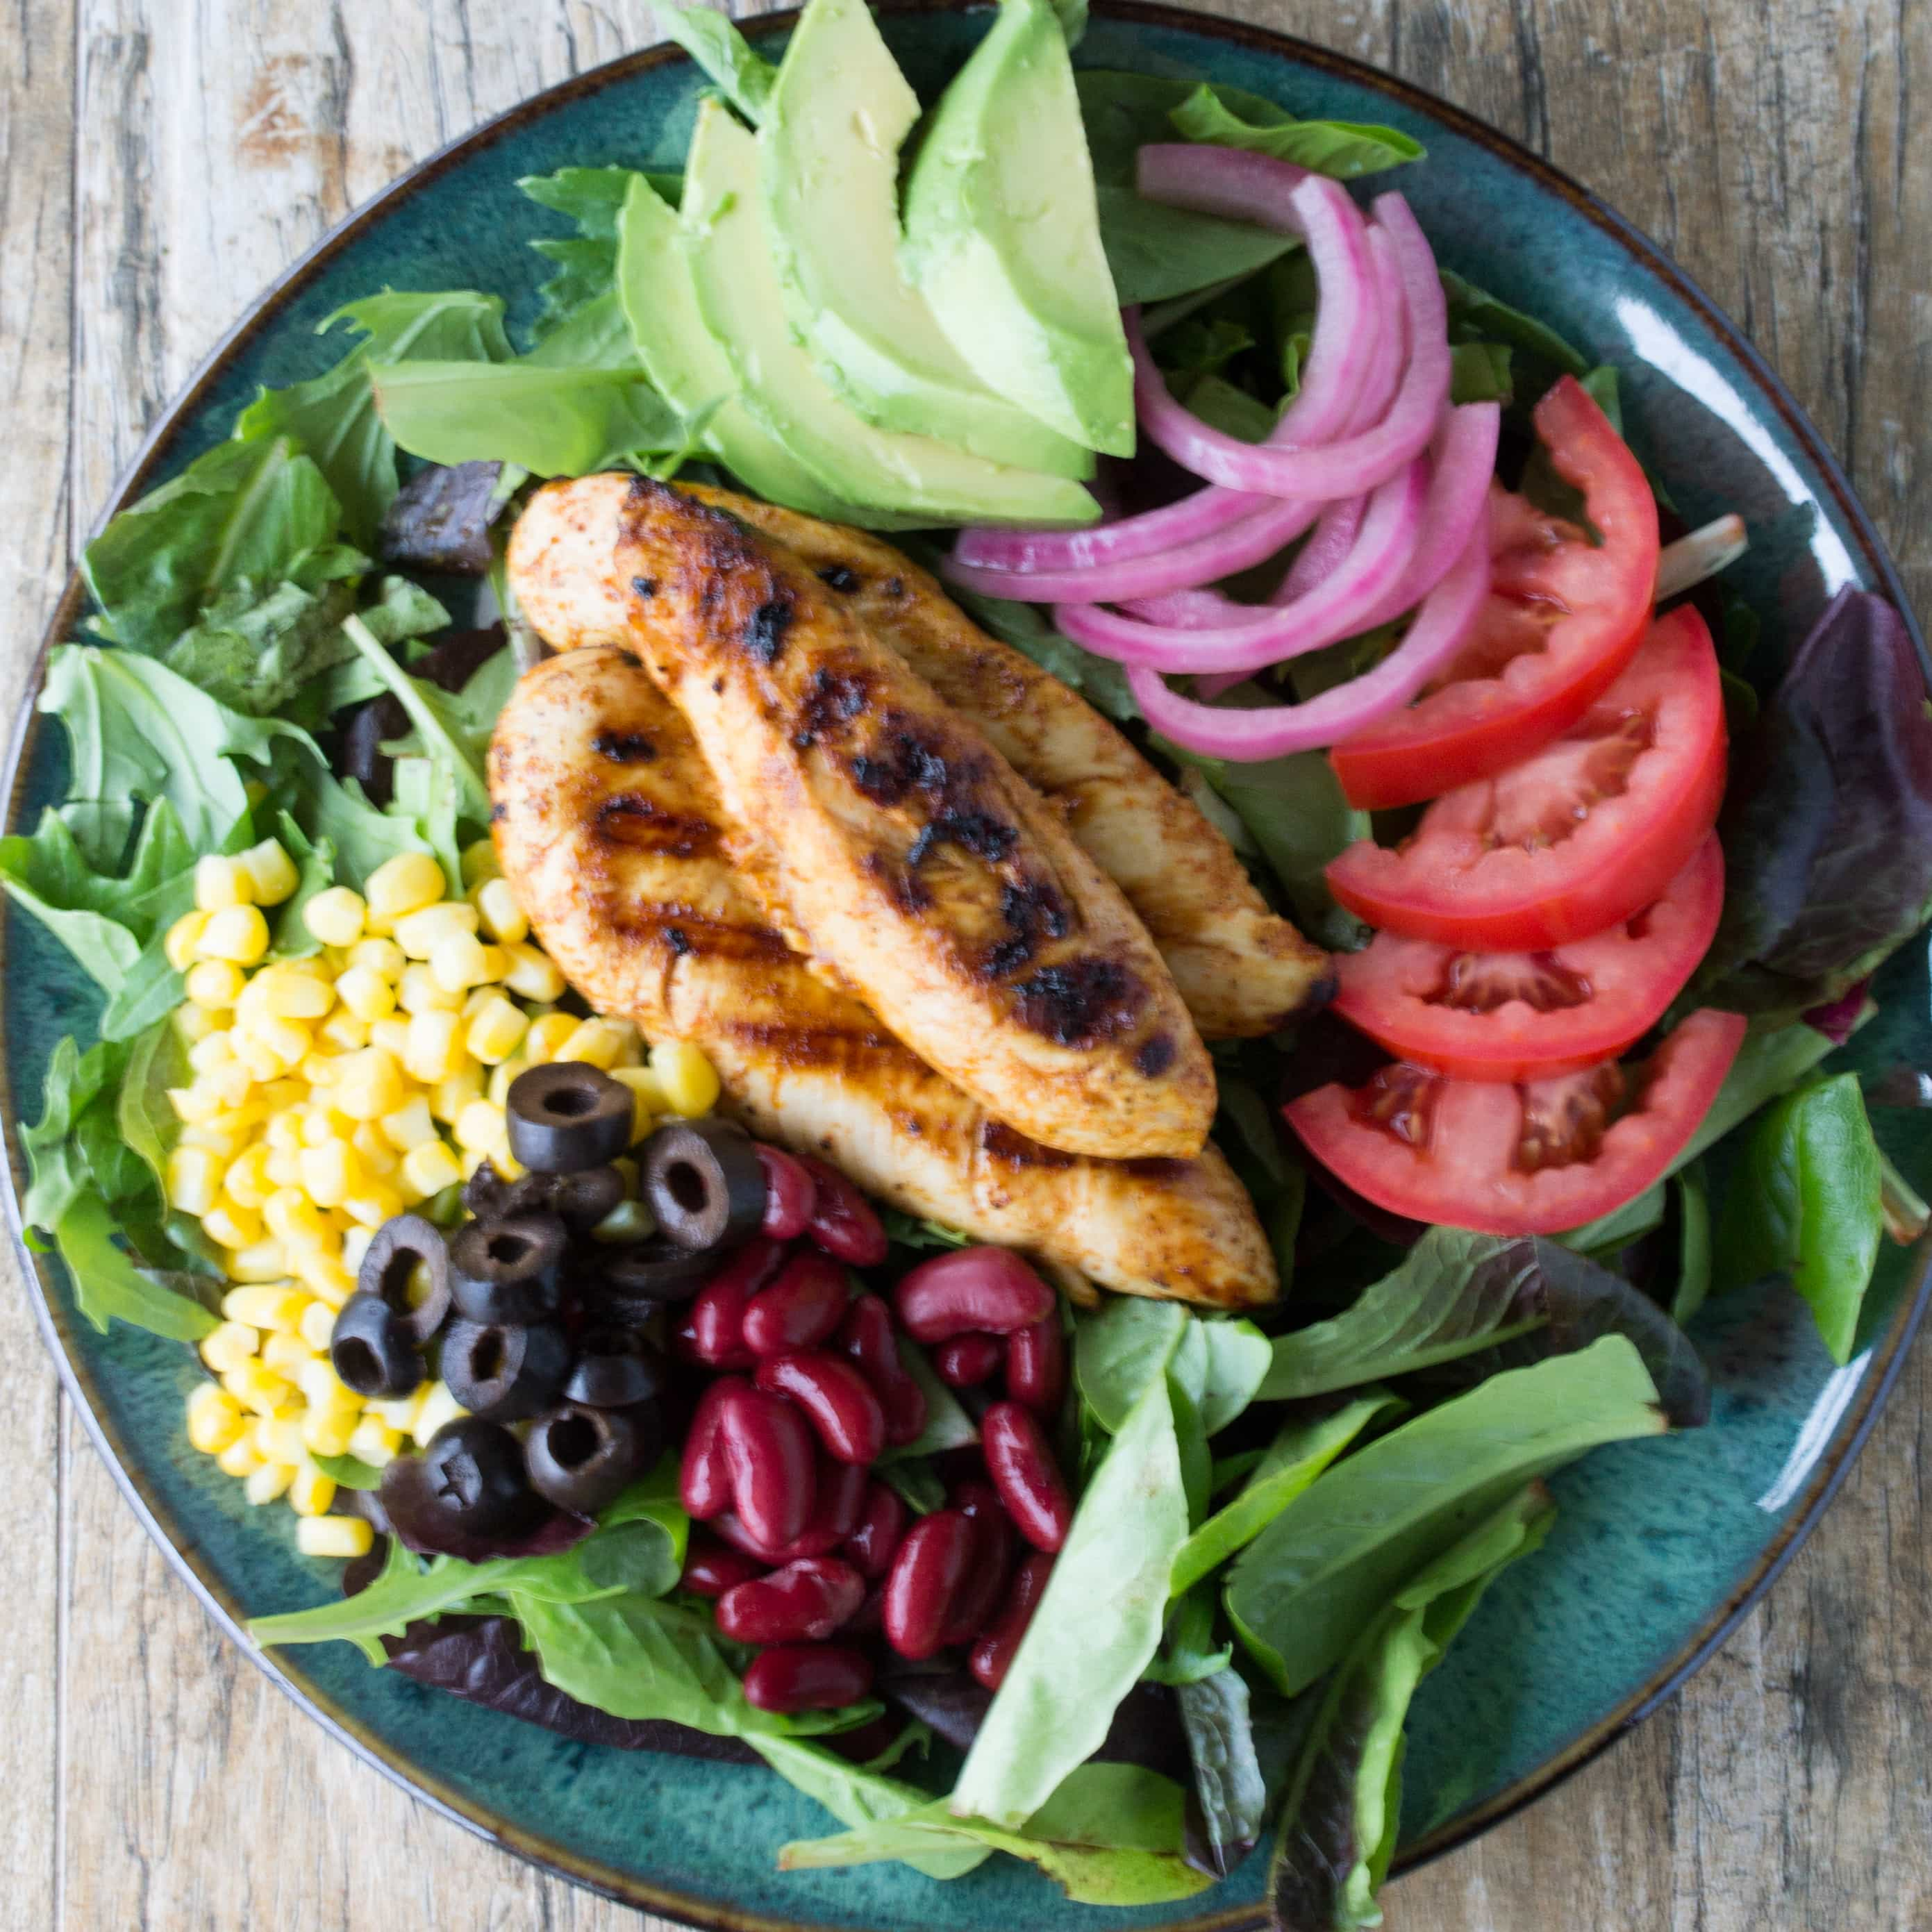 Healthy Taco Salad with Cilantro-Lime Vinaigrette